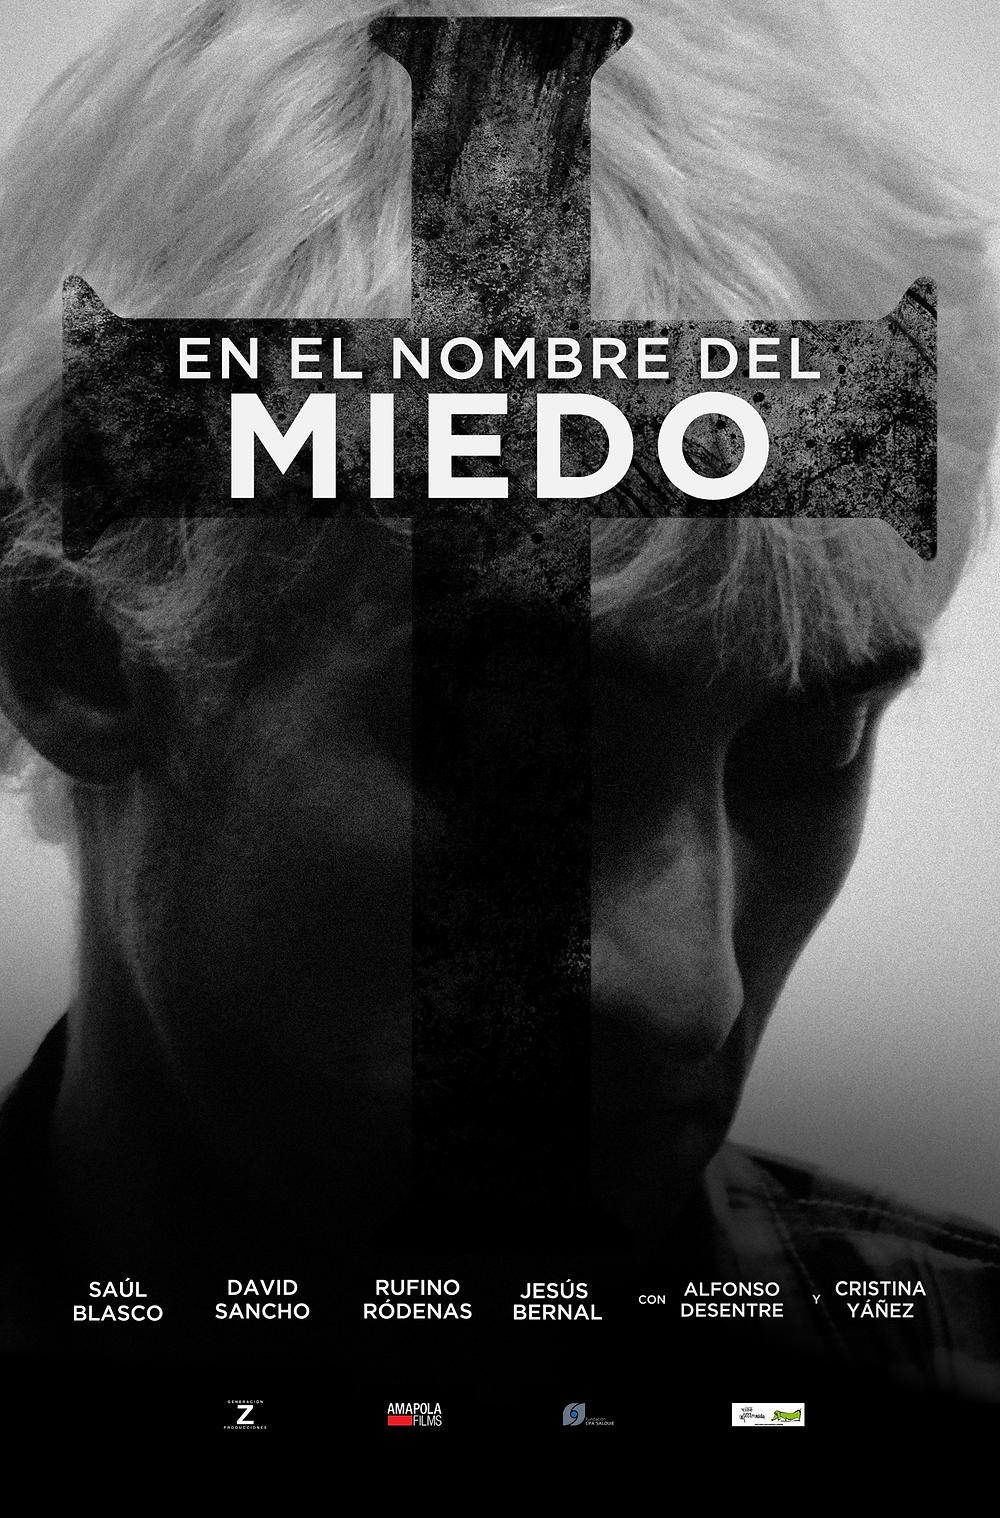 EN EL NOMBRE DEL MIEDO_poster.png